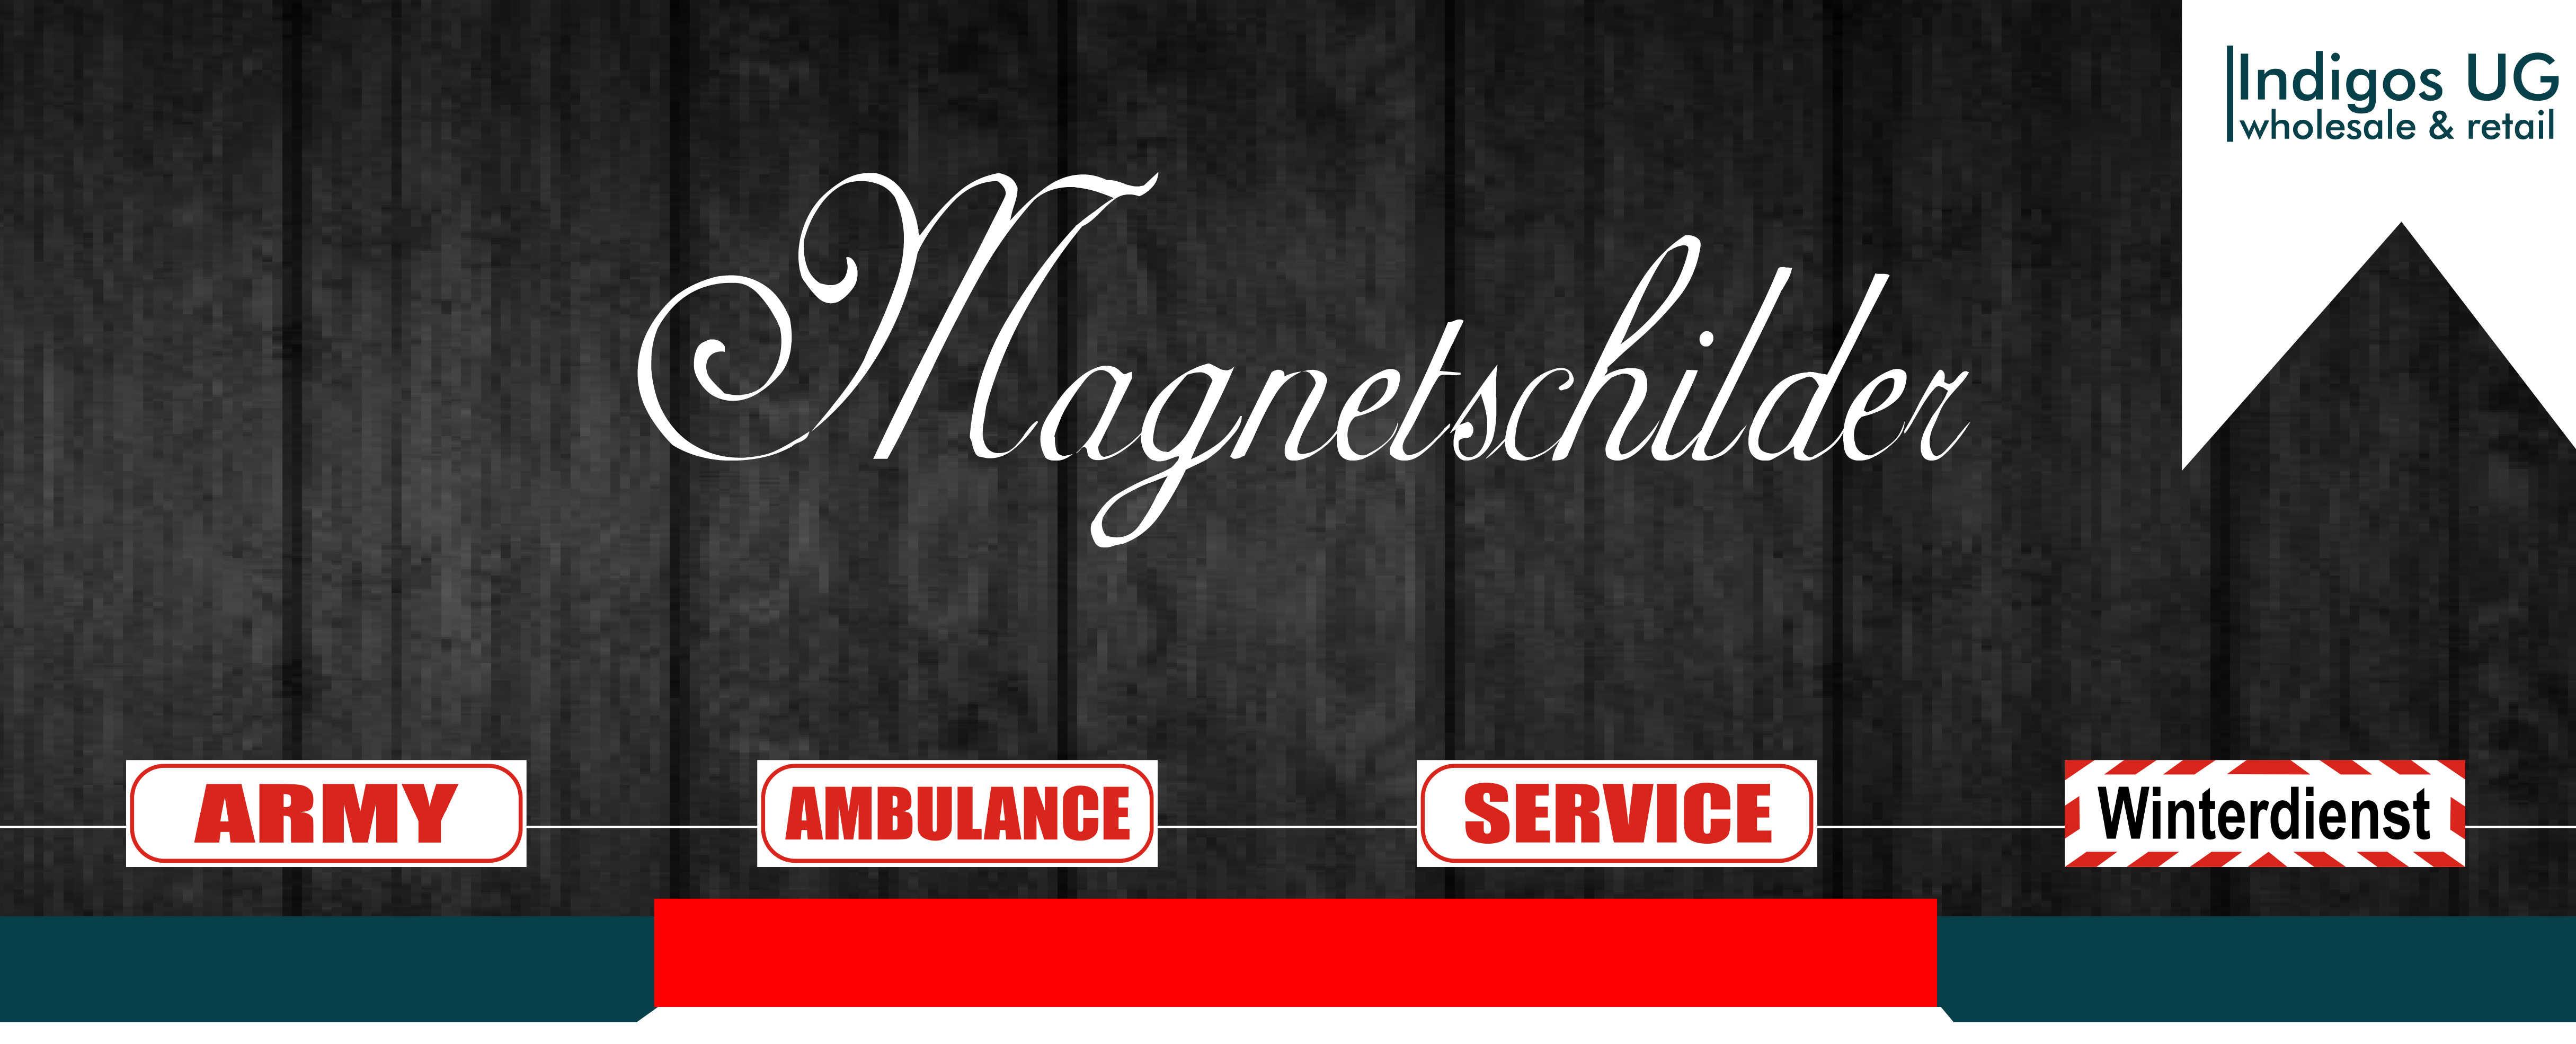 FAHRANFÄNGER Magnetfolie für´s Auto Fahrschule Baustelle JDM261 Magnetschild